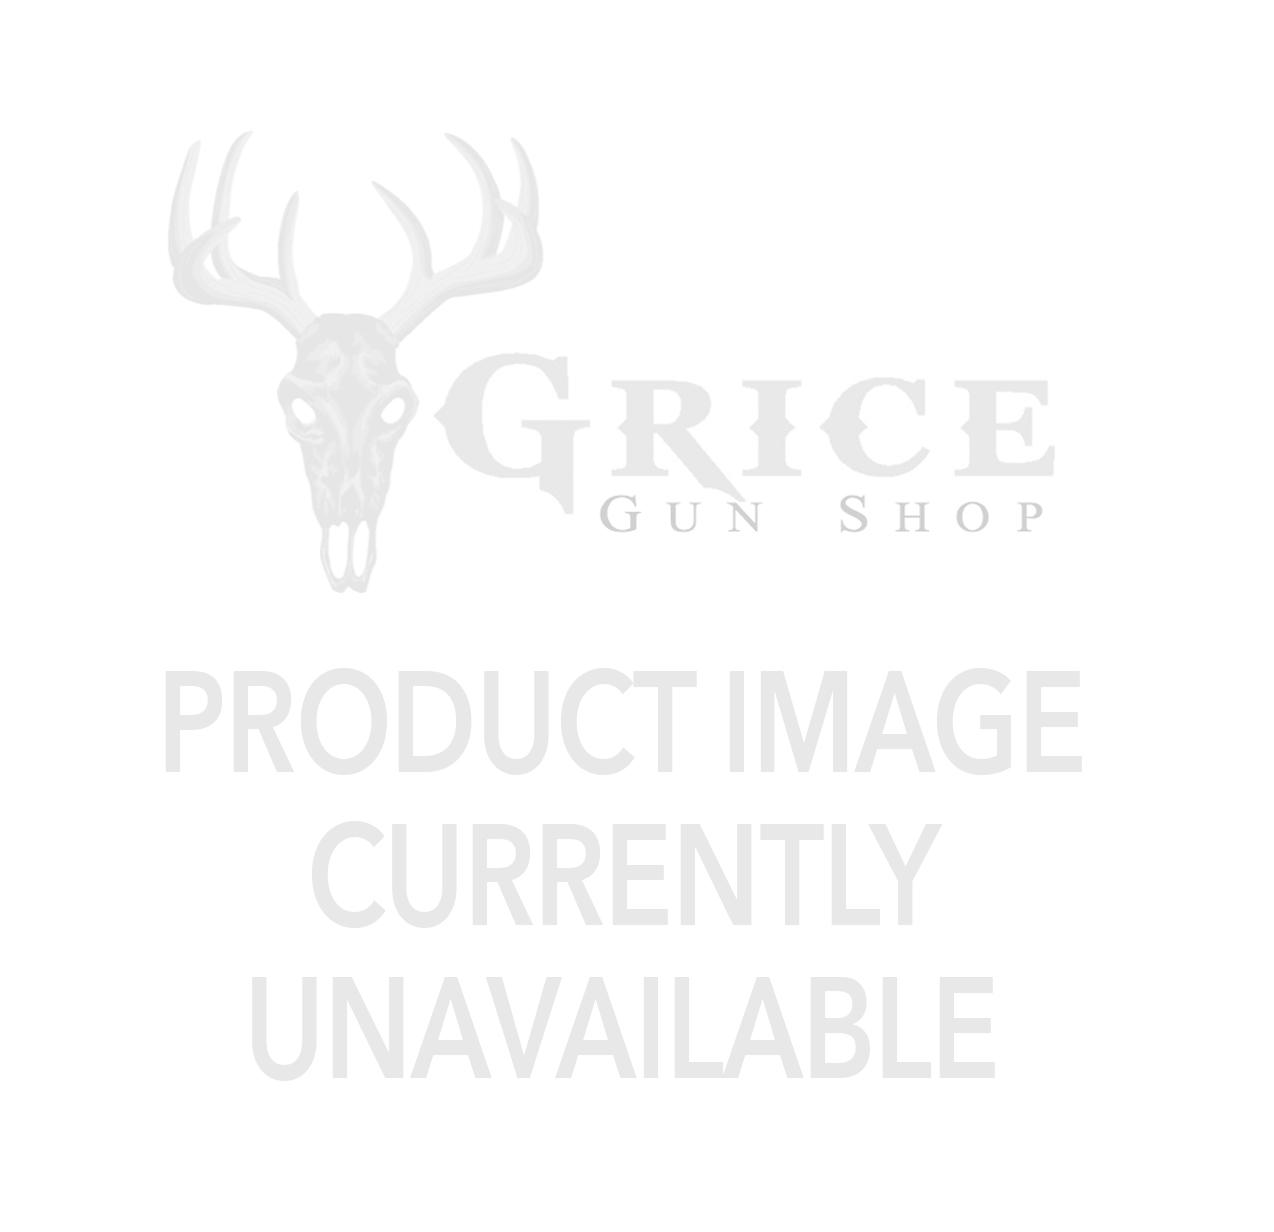 Legacy - Howa 1500 Gray Laminate 223Rem